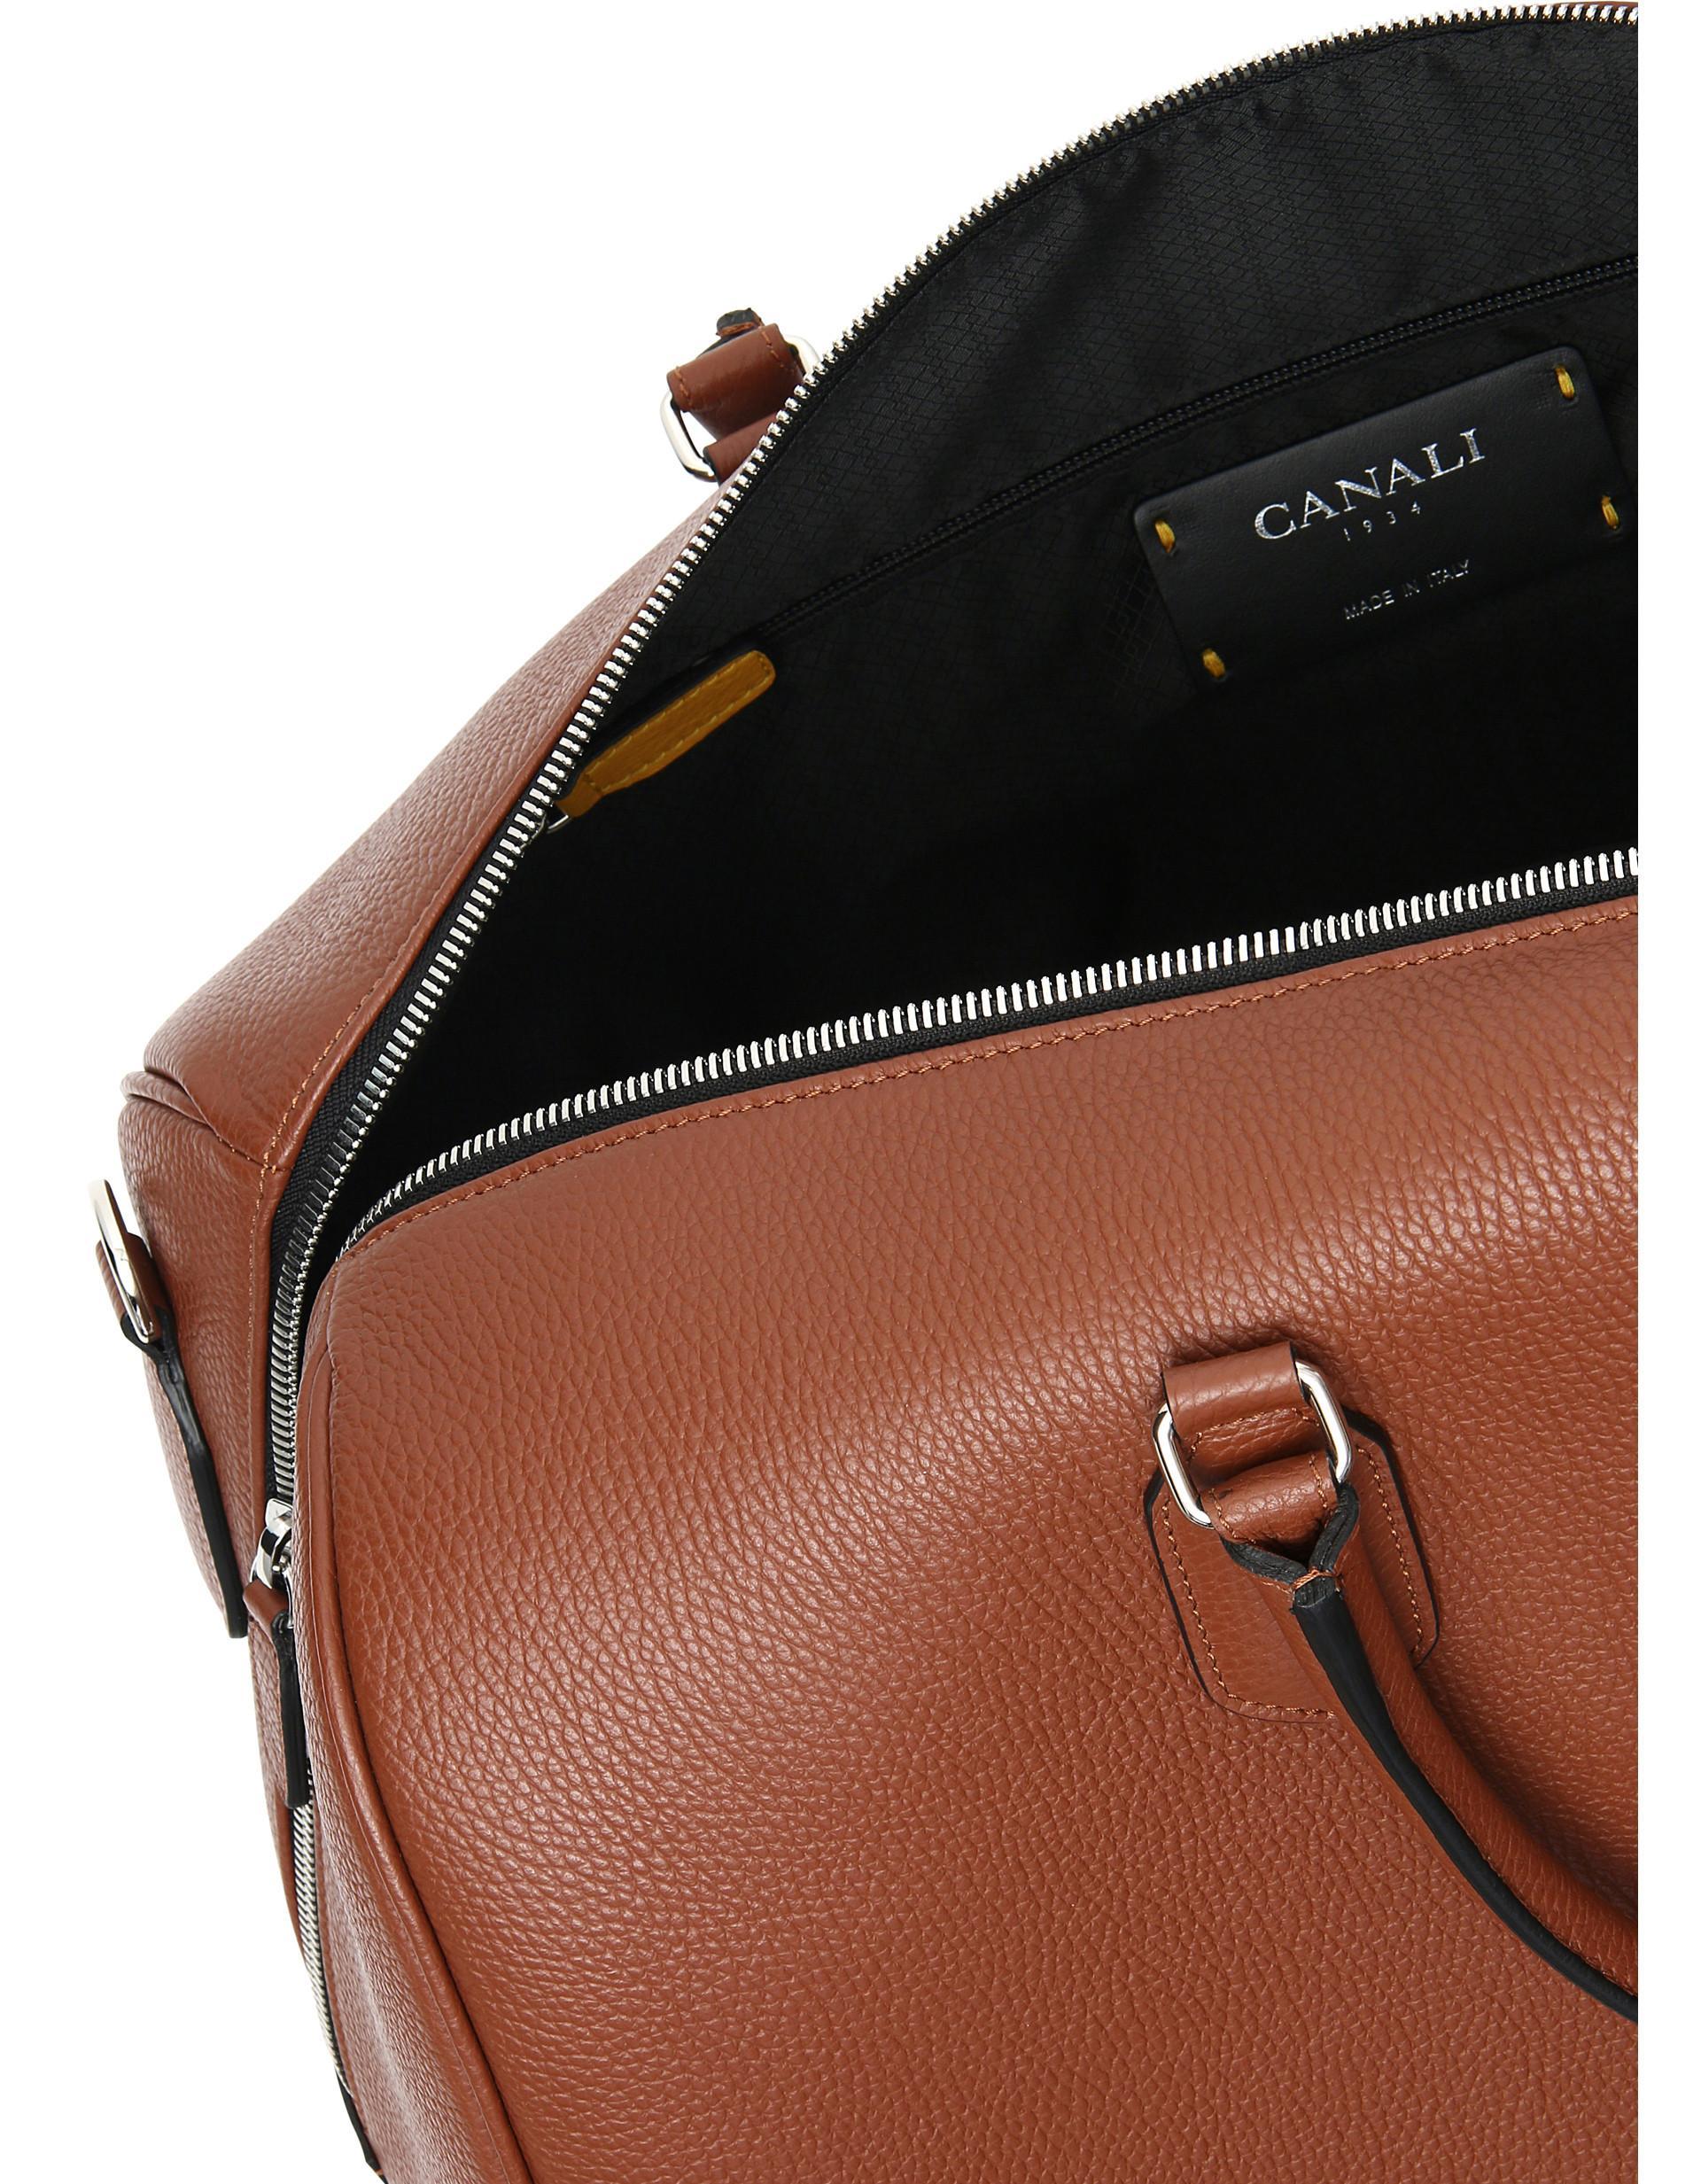 e6331b3aa Canali - Brown Terracotta Calfskin Leather Travel Duffle Bag for Men -  Lyst. View fullscreen